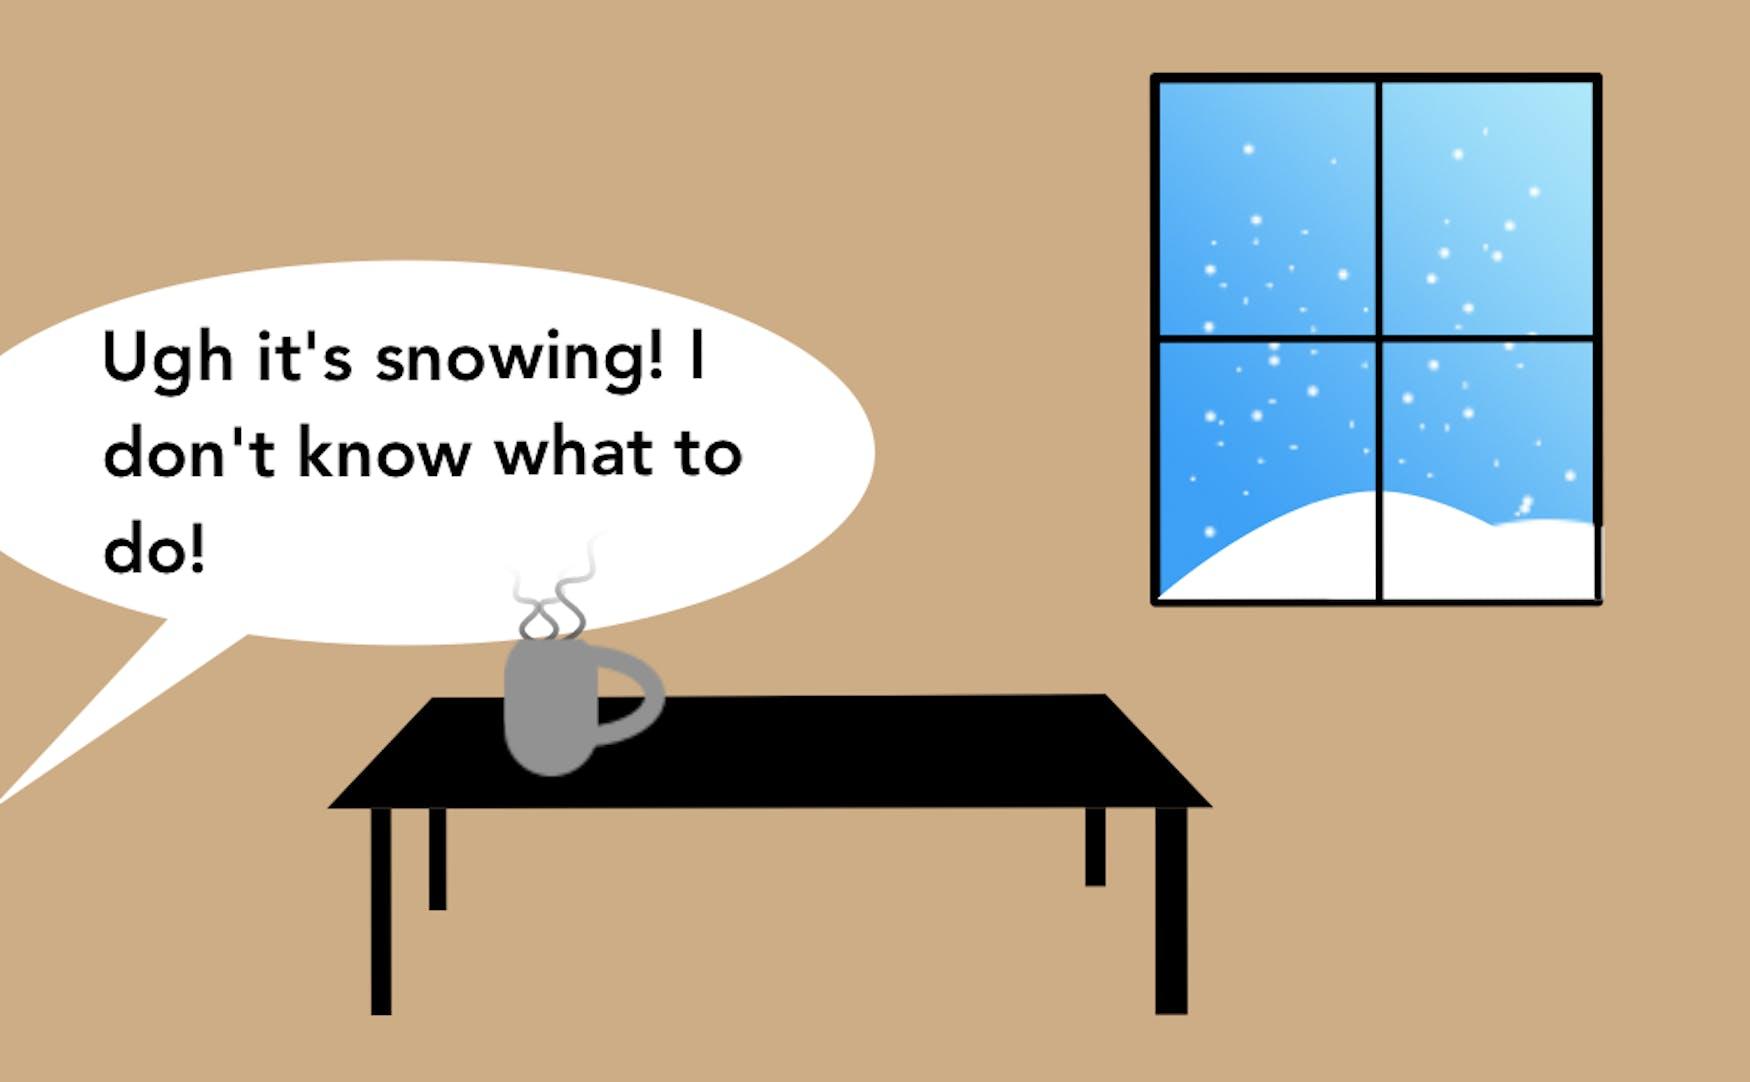 cold-weather-cartoon-1